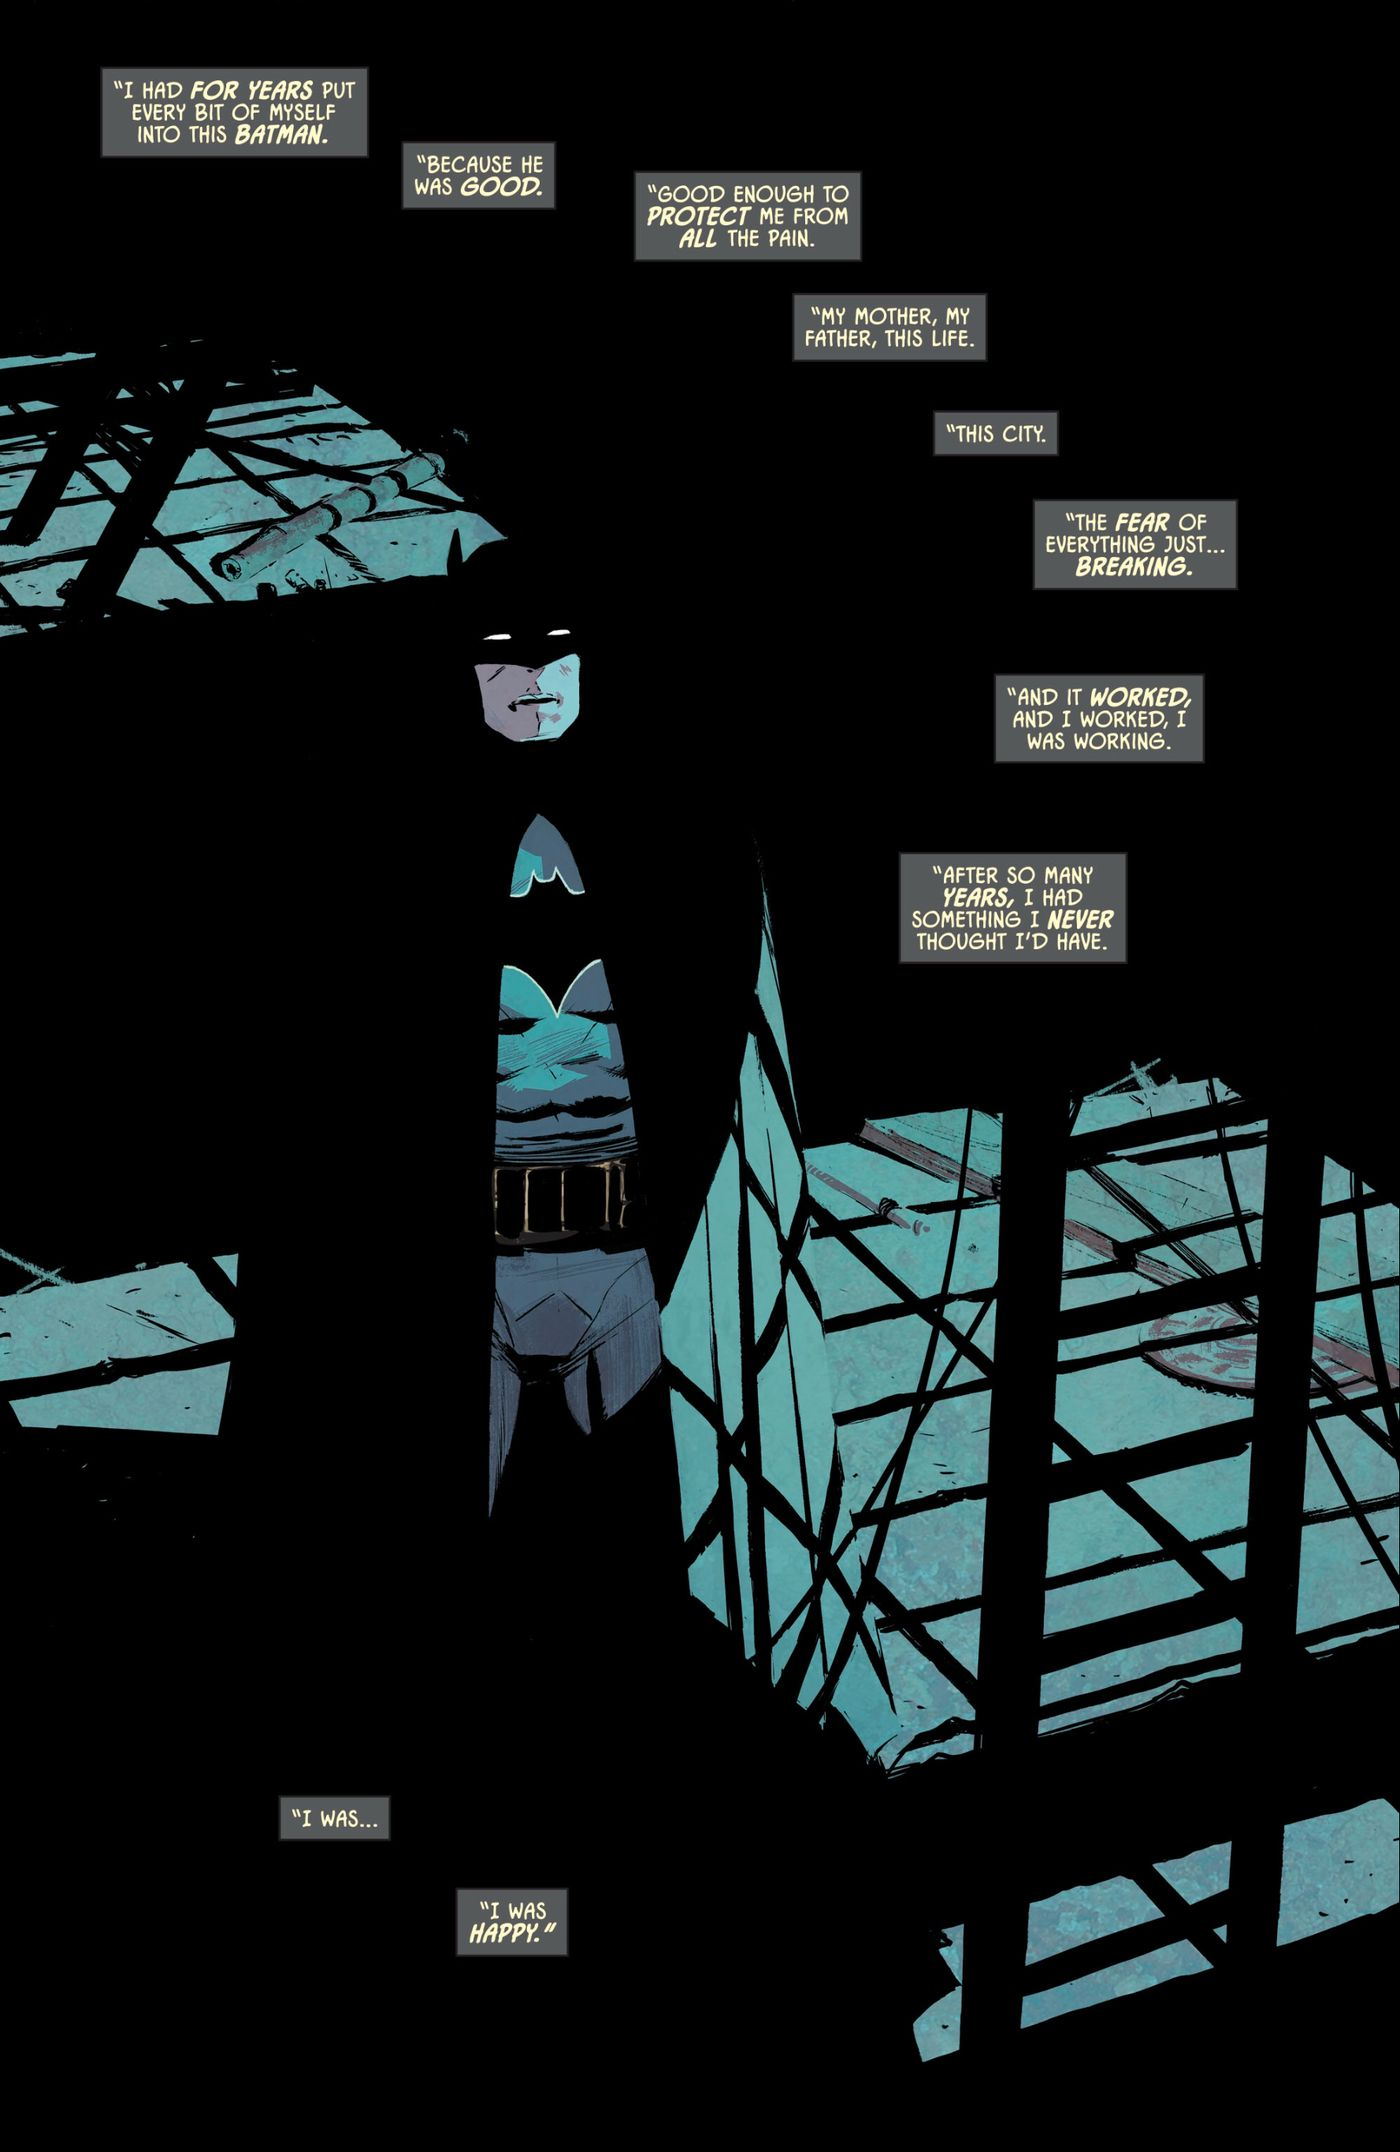 In Batman #53, Bruce Wayne saves Mr  Freeze from The Dark